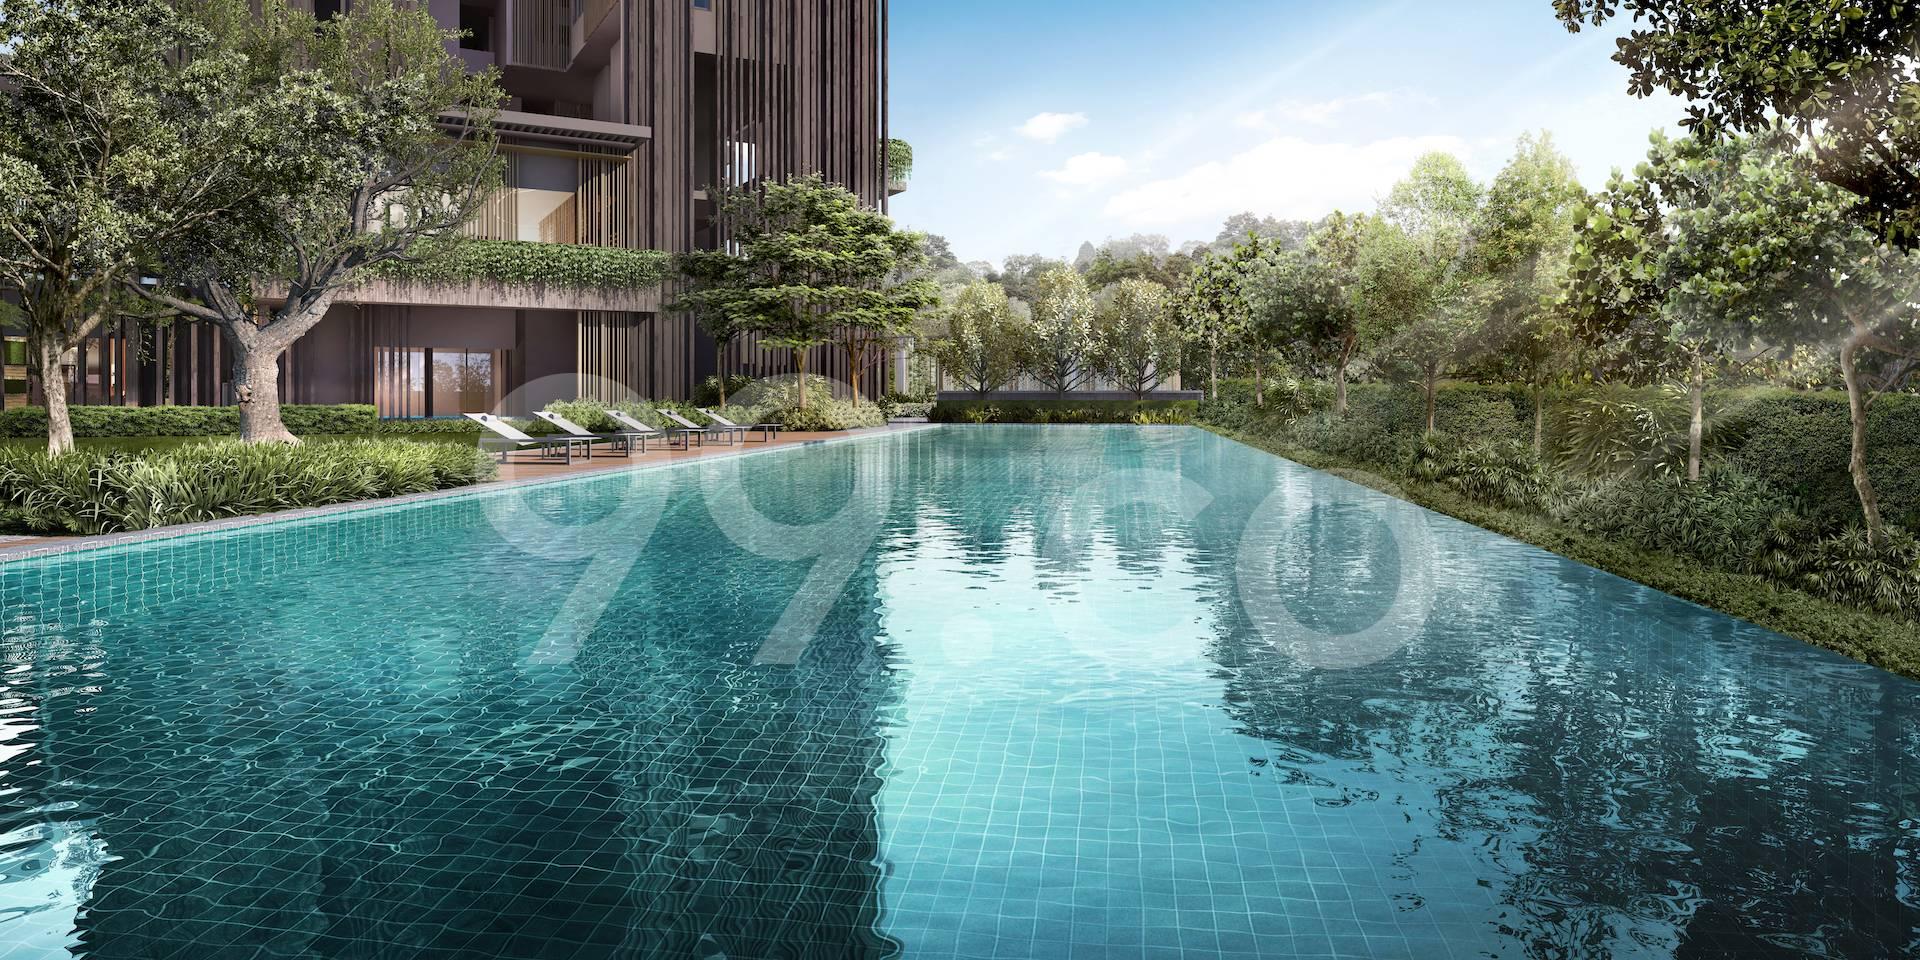 The Avenir Pool